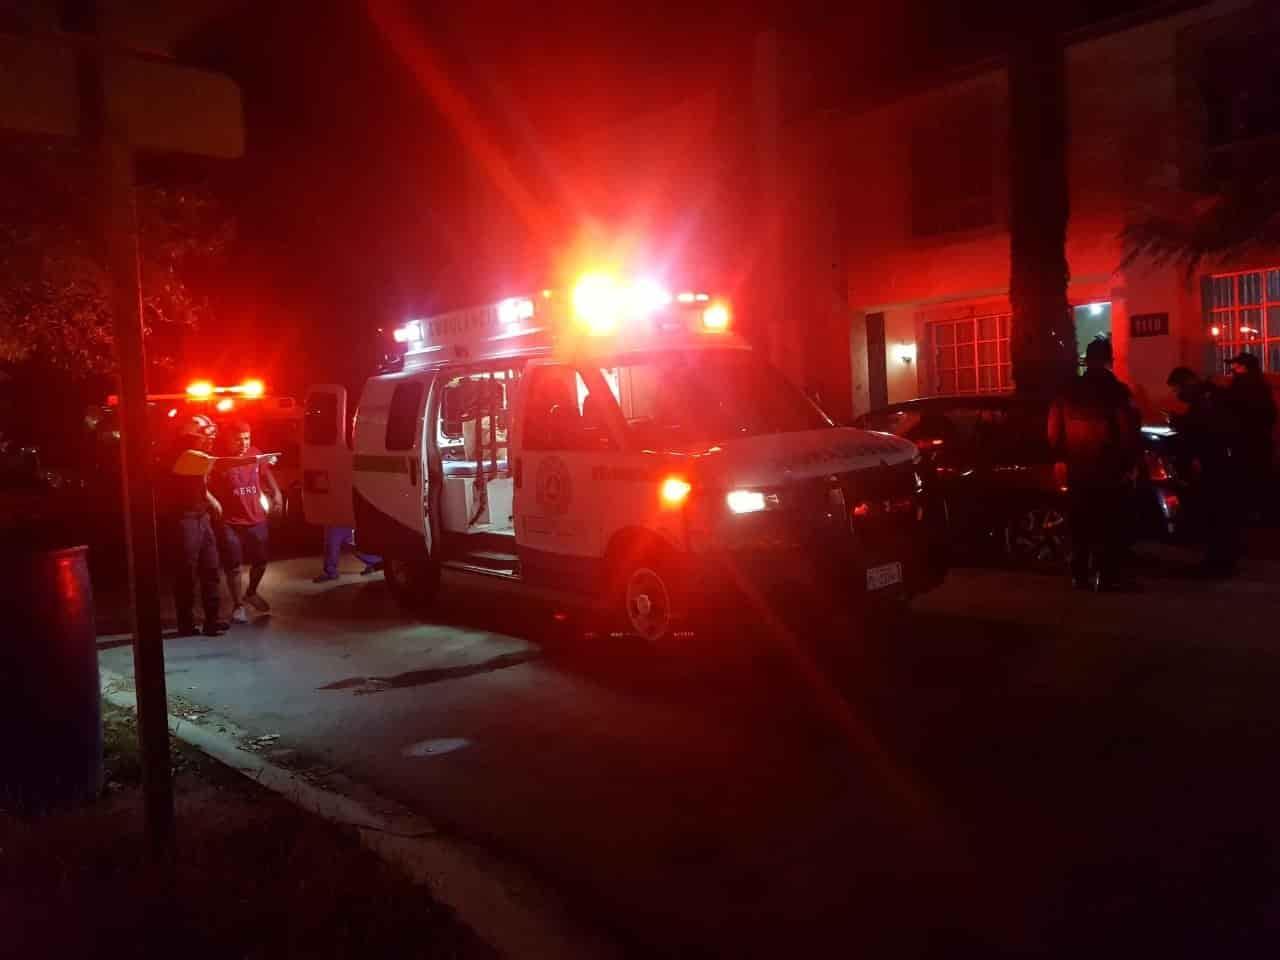 Tres hombres resultaron con diversas heridas luego de ser agredidos por hombres armados